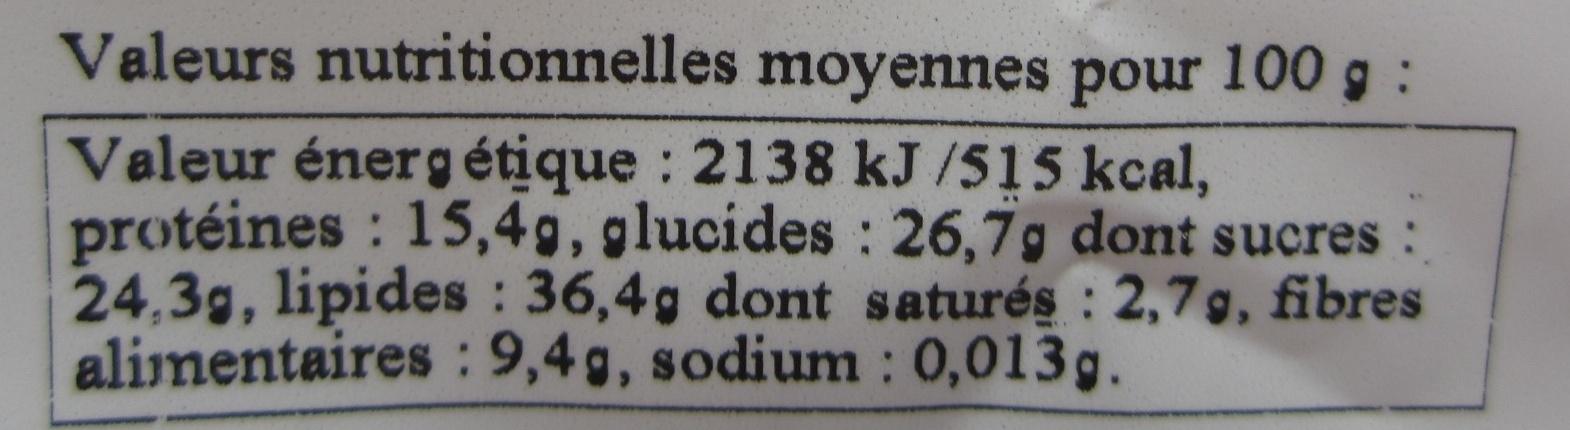 Formule Equilibre - Informations nutritionnelles